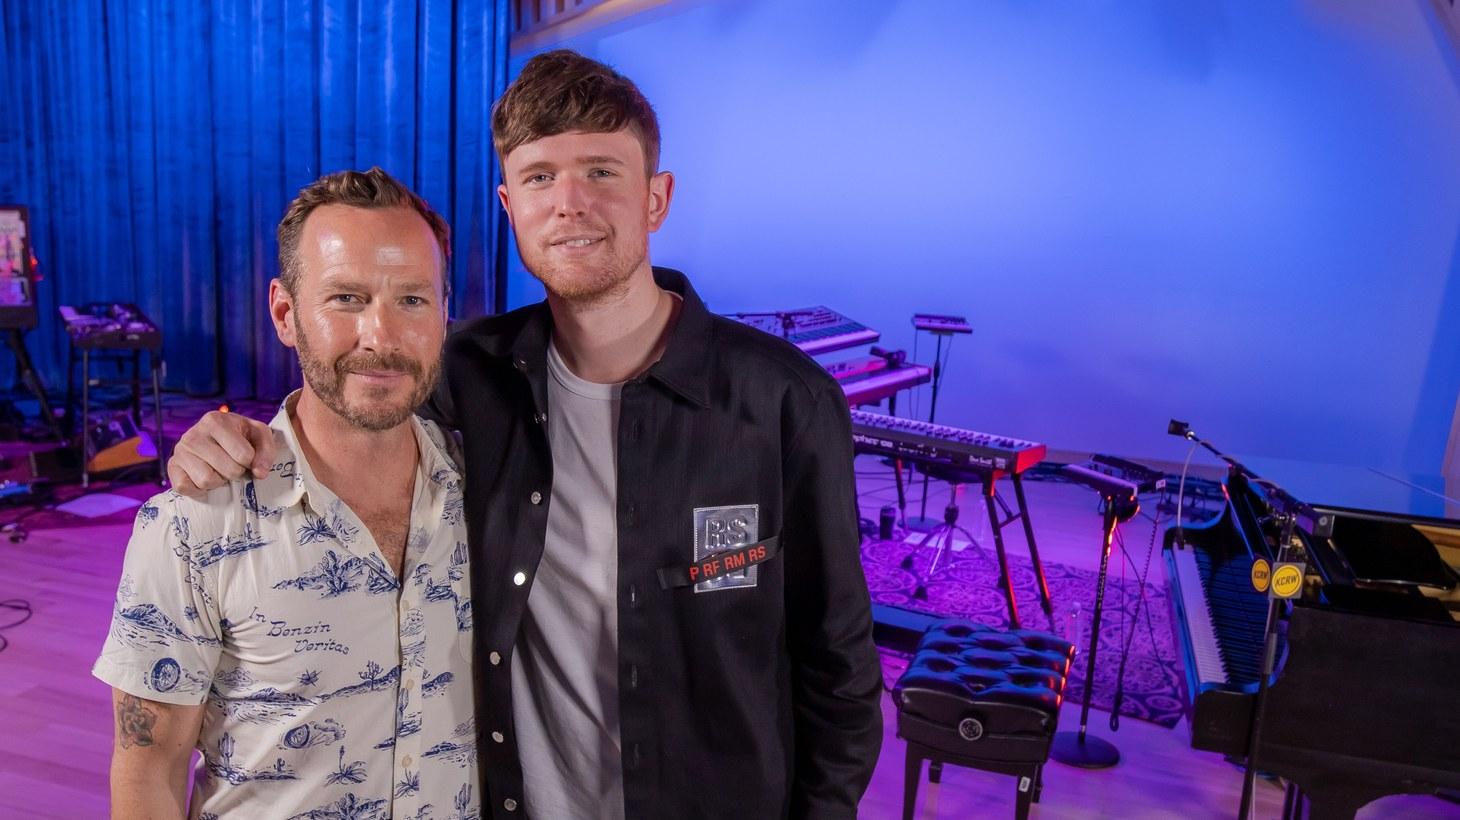 Jason Bentley at KCRW's new studio with James Blake